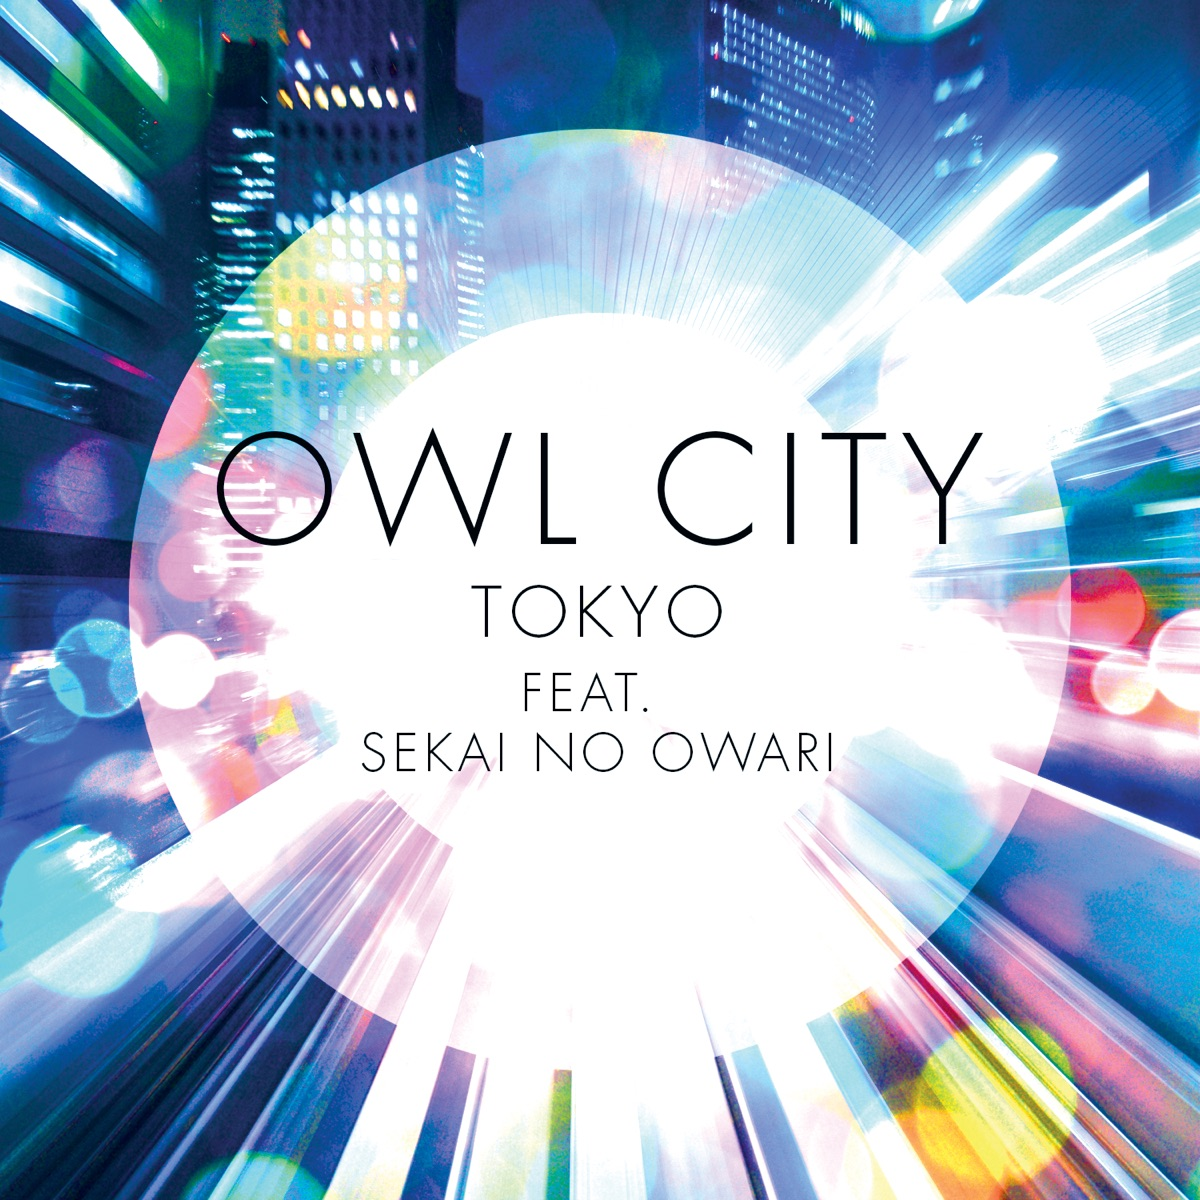 Tokyo Album Cover by Owl City